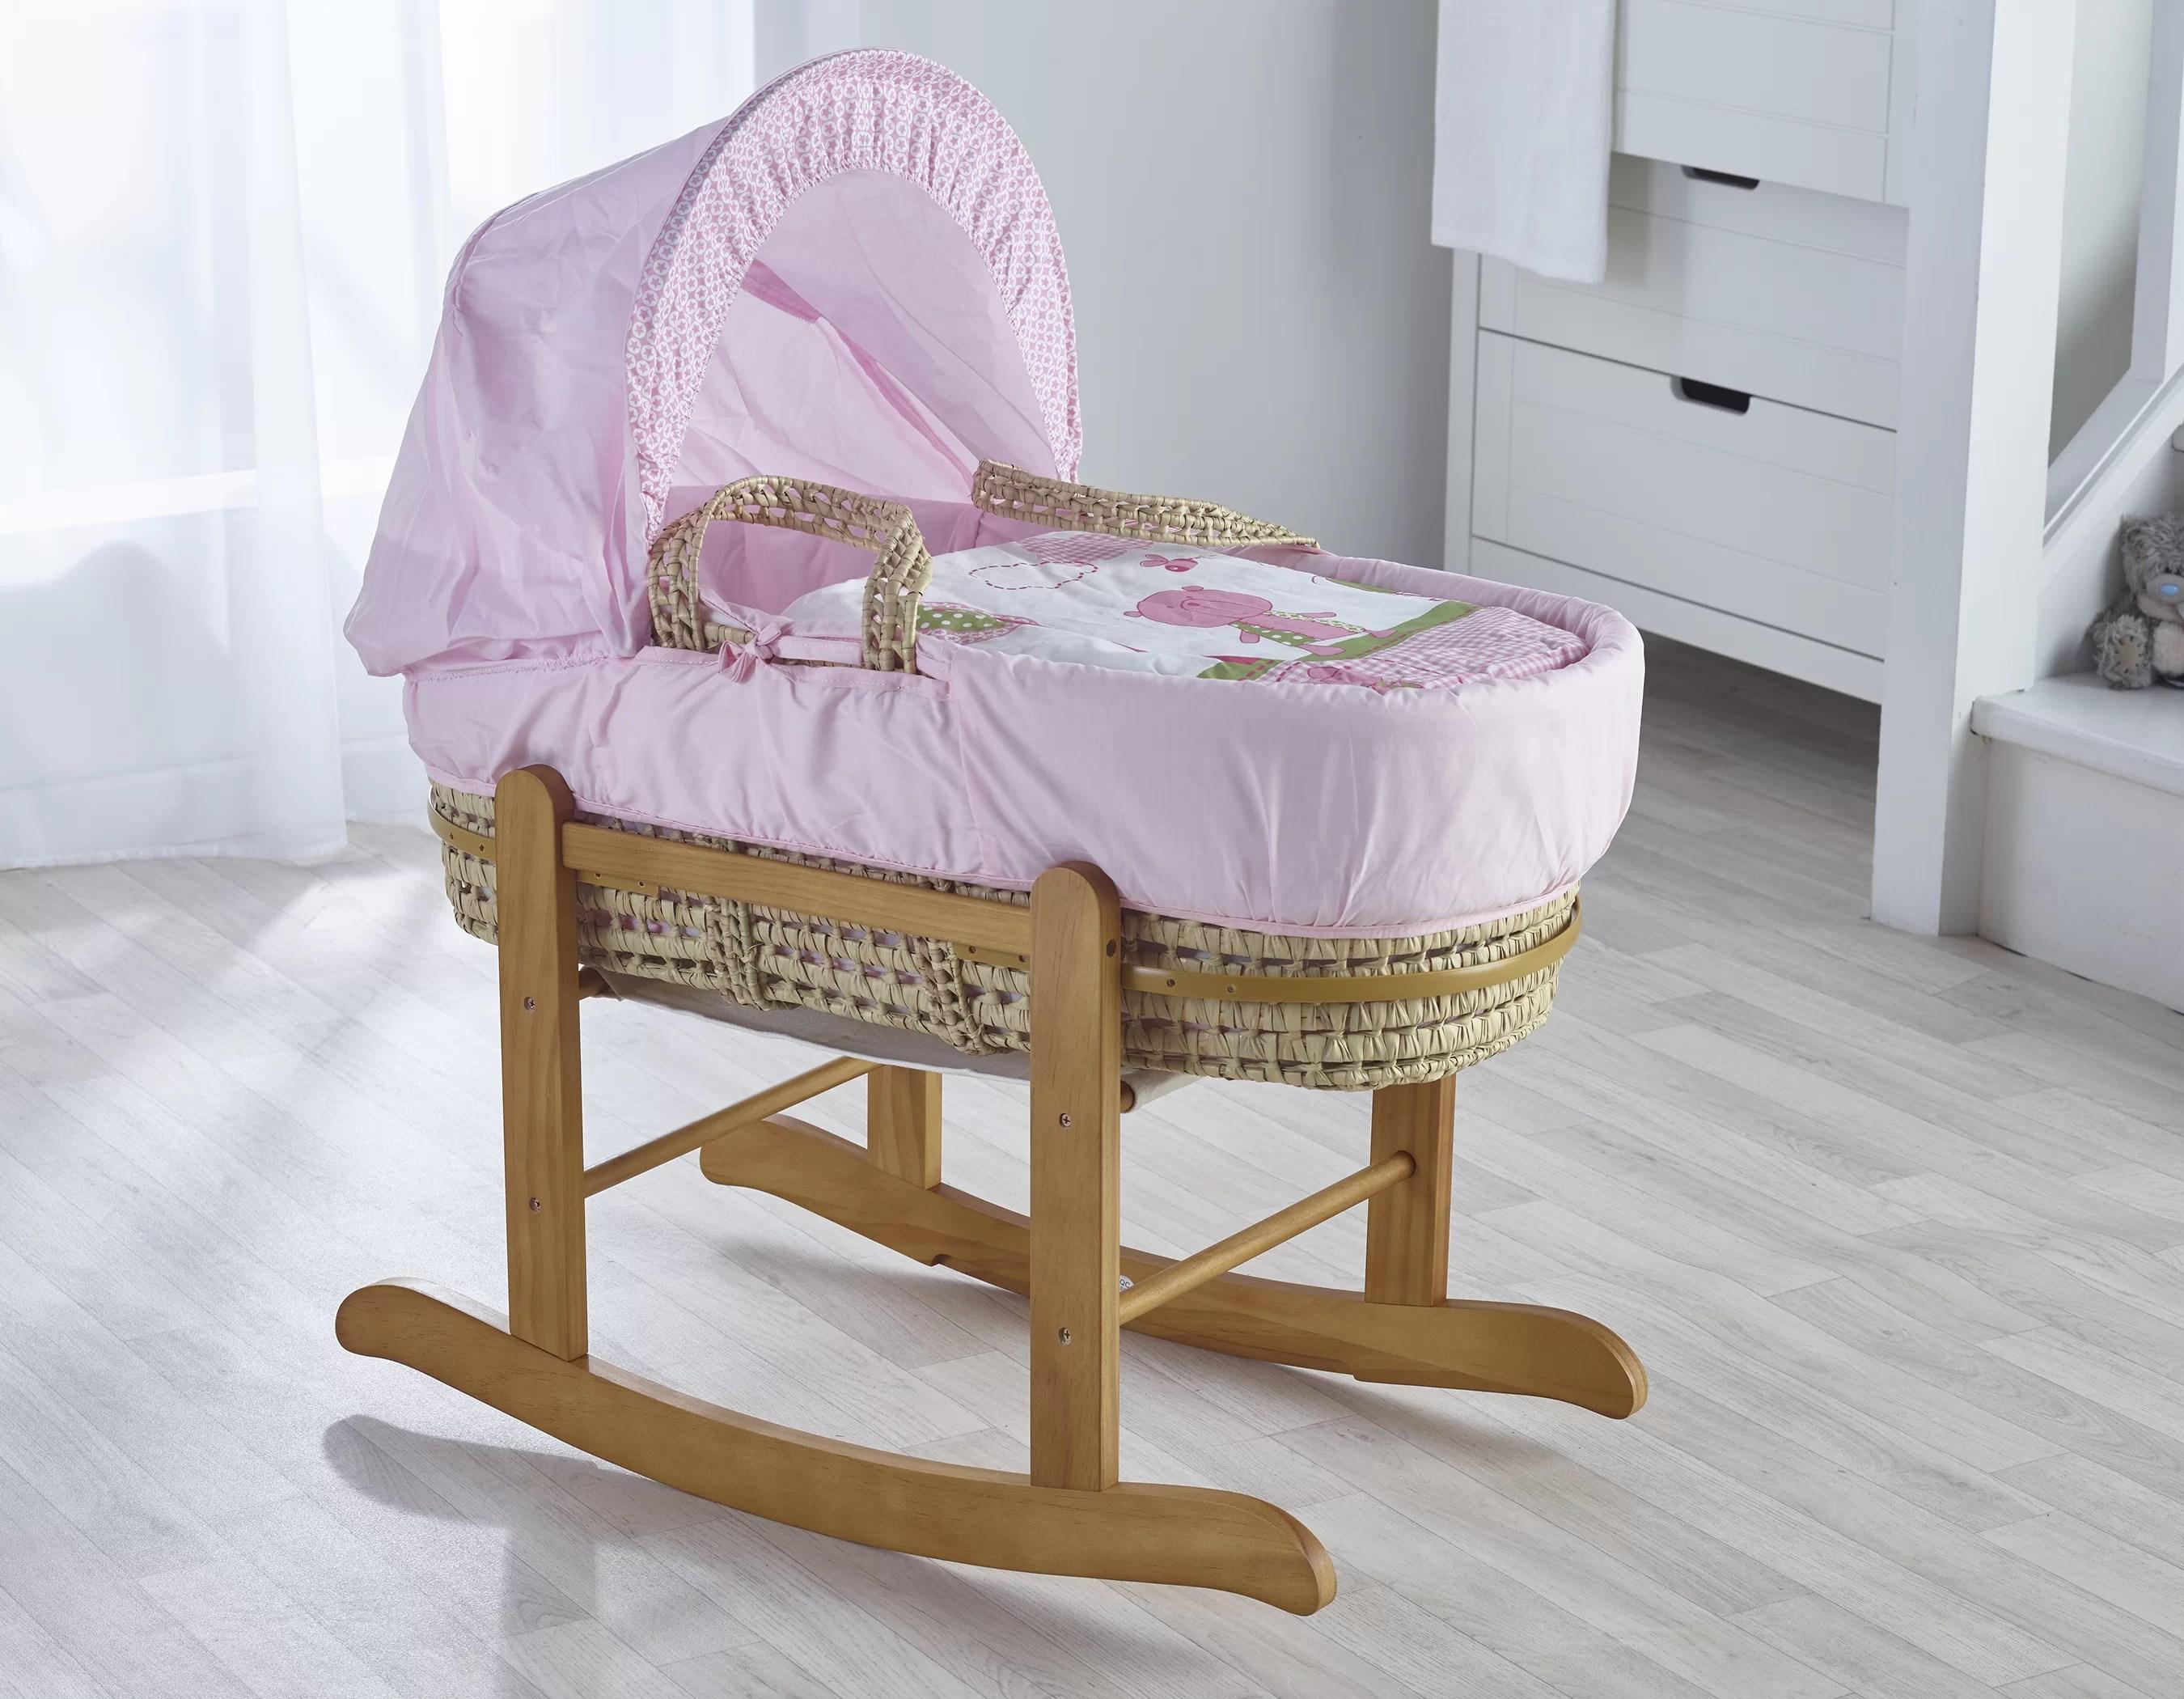 Christiane wegner in baby stubenwagen günstig kaufen ebay